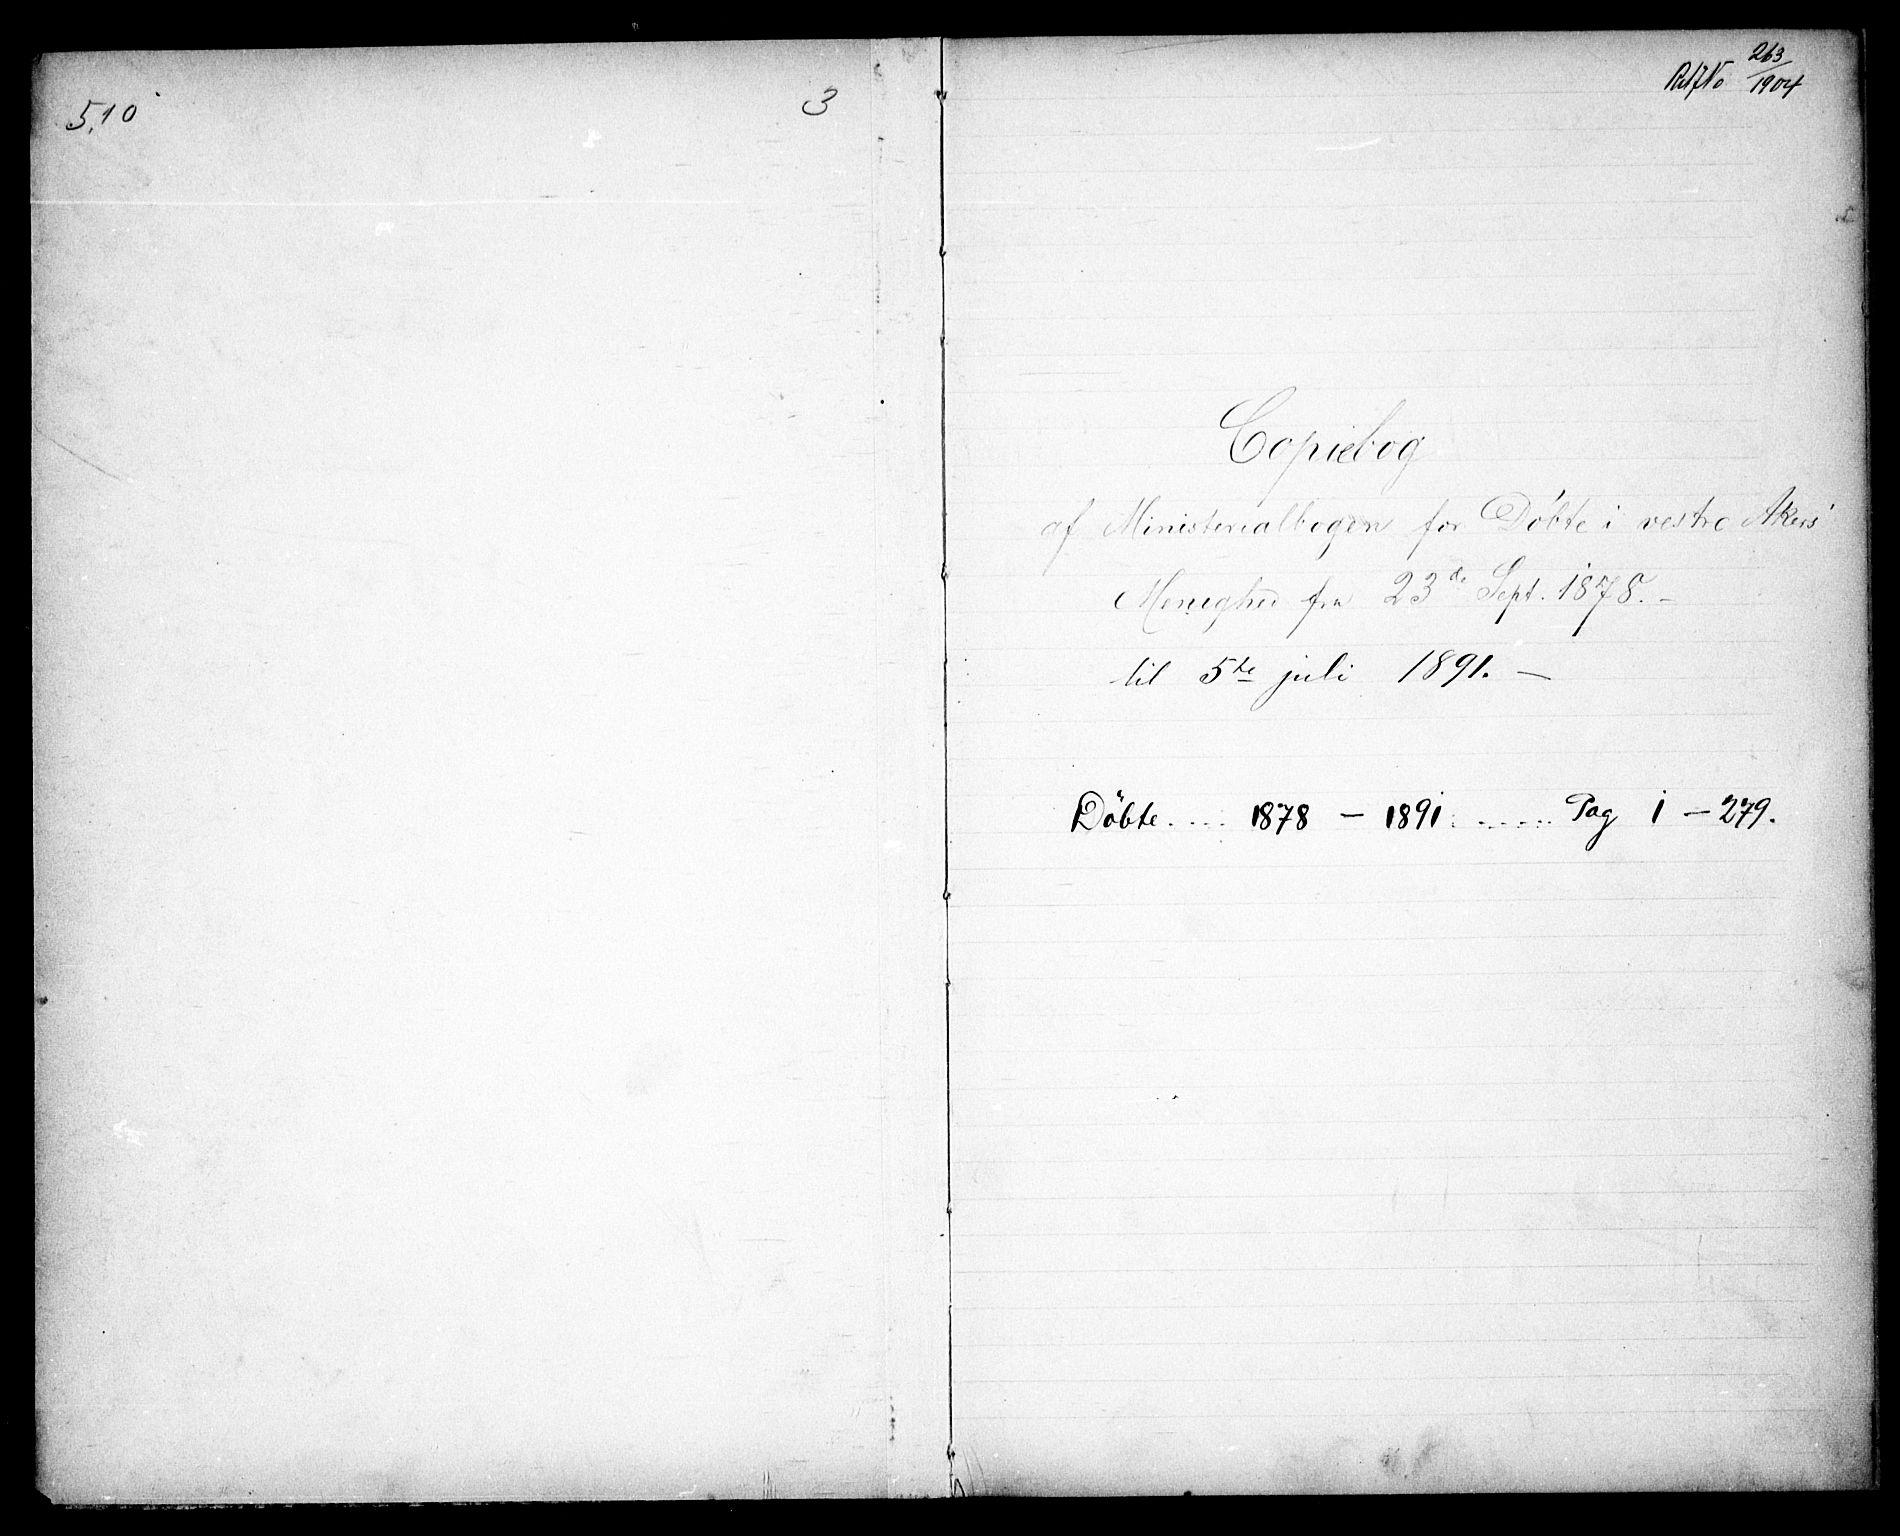 SAO, Vestre Aker prestekontor Kirkebøker, G/Ga/L0003: Klokkerbok nr. I 3, 1878-1891